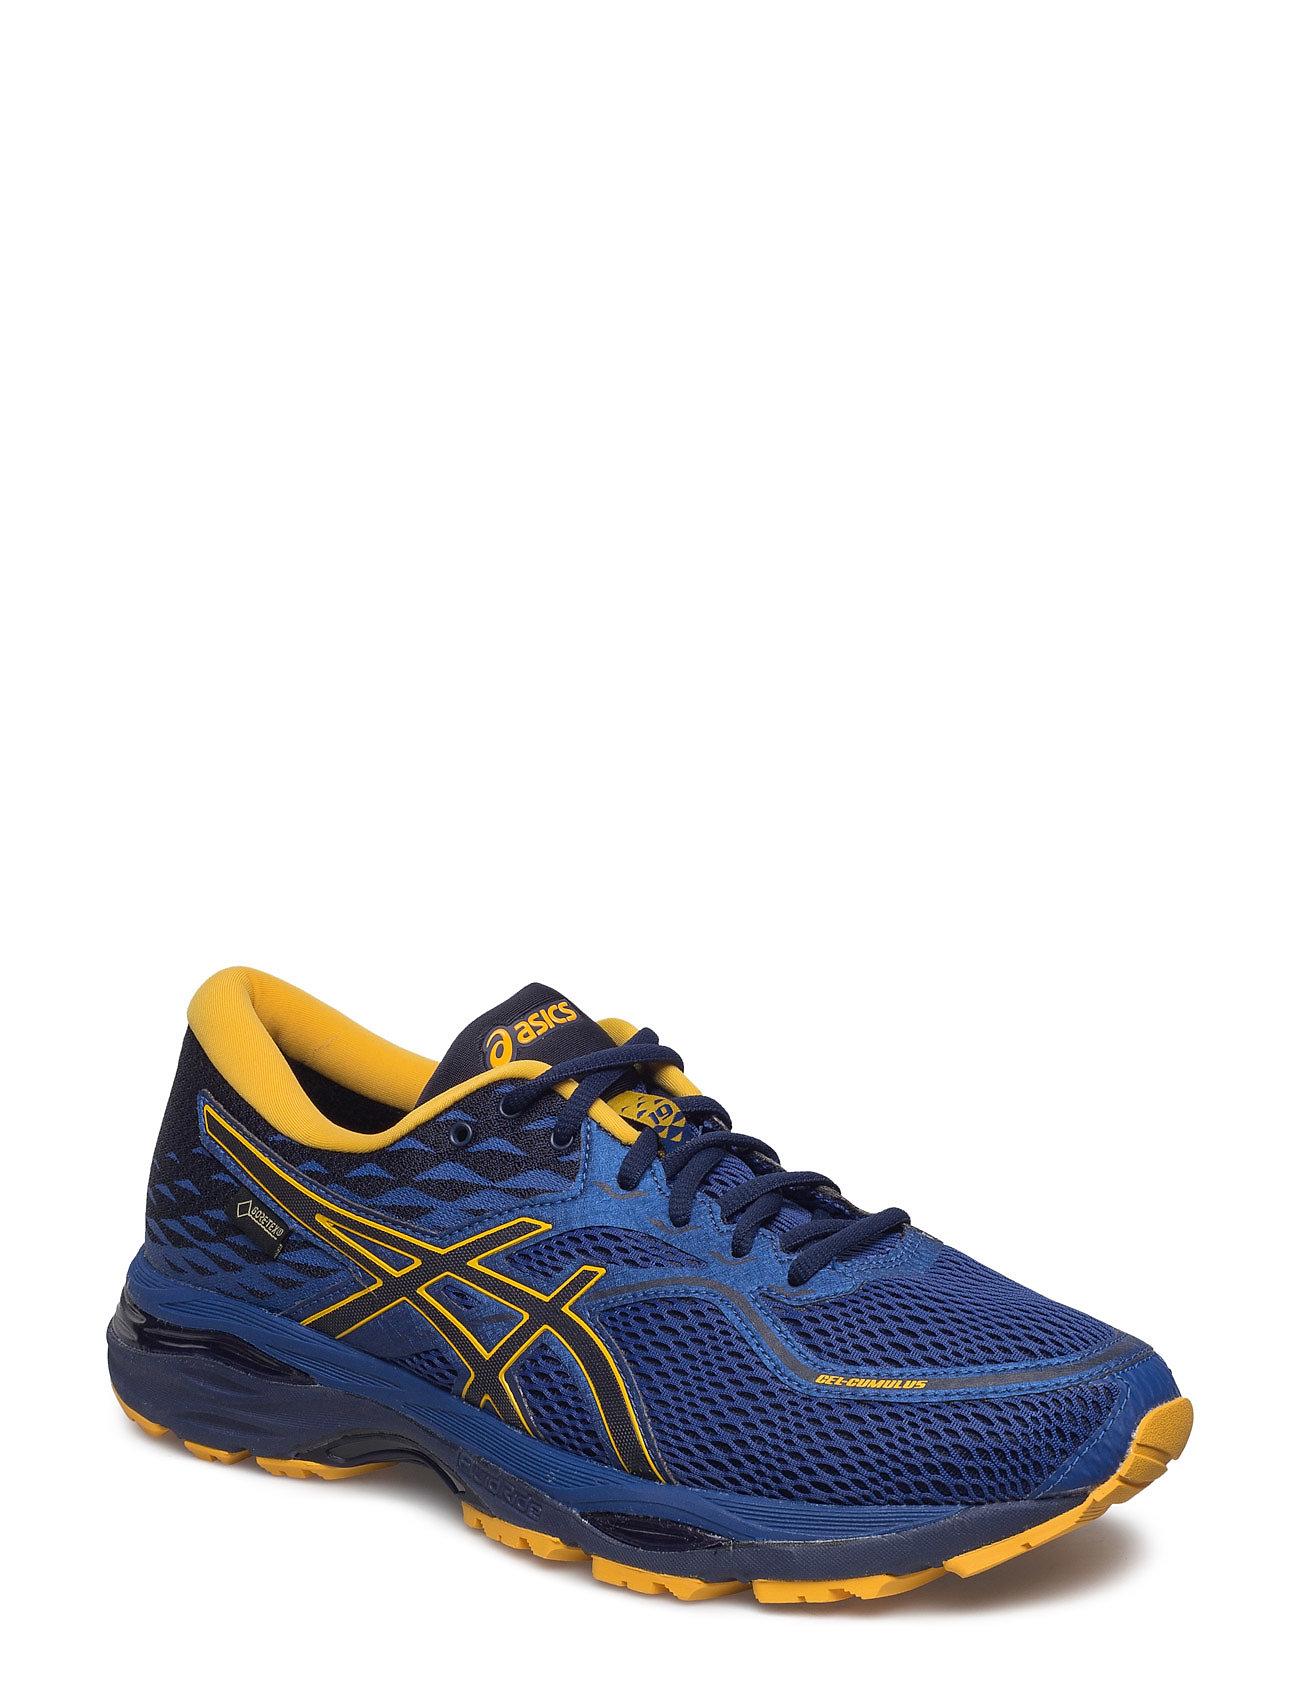 Gel-Cumulus 19 G-Tx Asics Sports sko til Herrer i